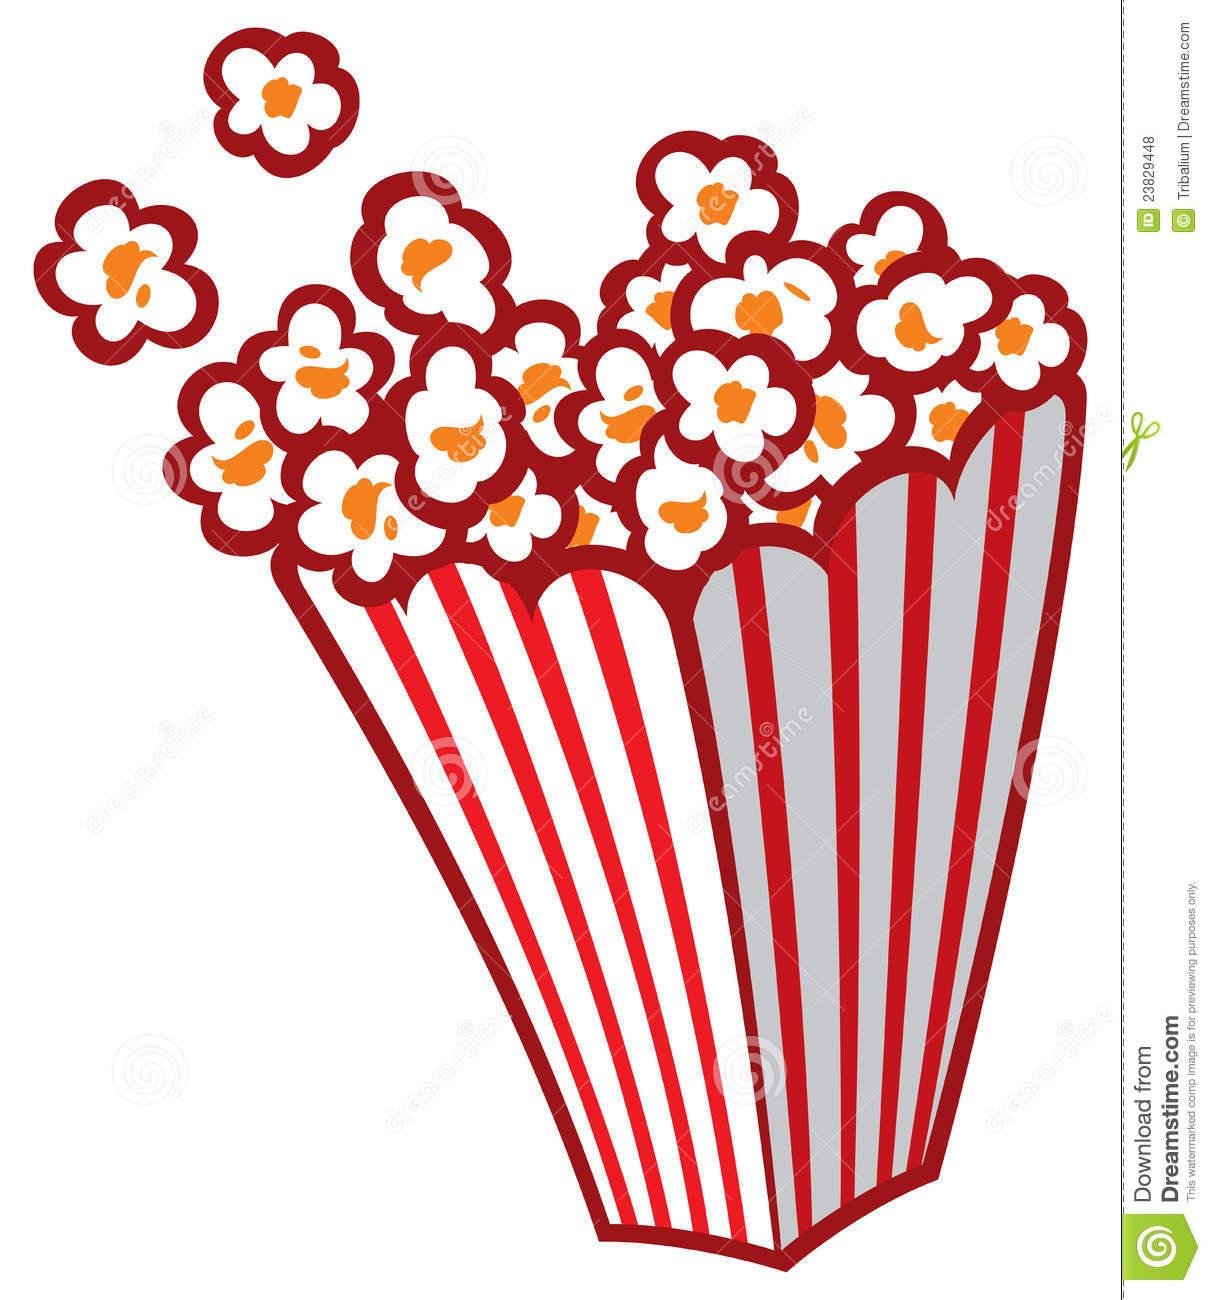 1211x1300 Popcorn Clipart Popcorn Bag